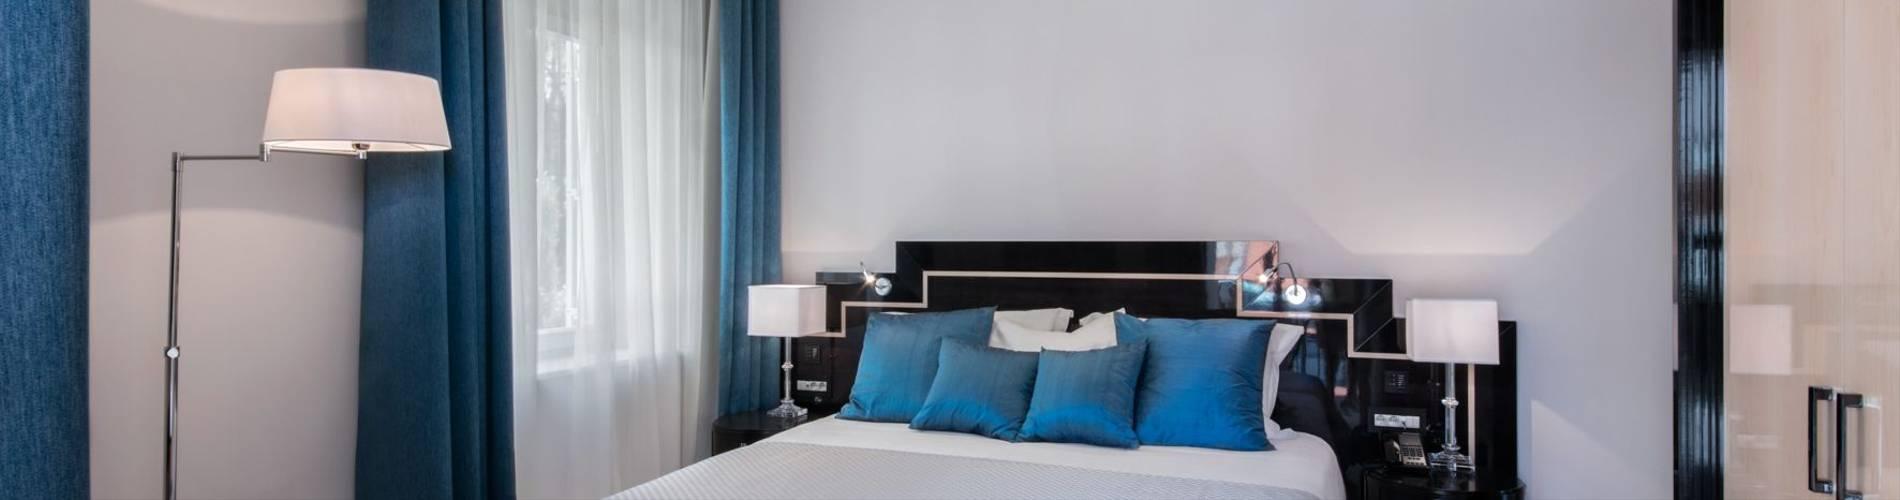 23. Boutique Hotel Alhambra_augusta room (3) (1).jpg